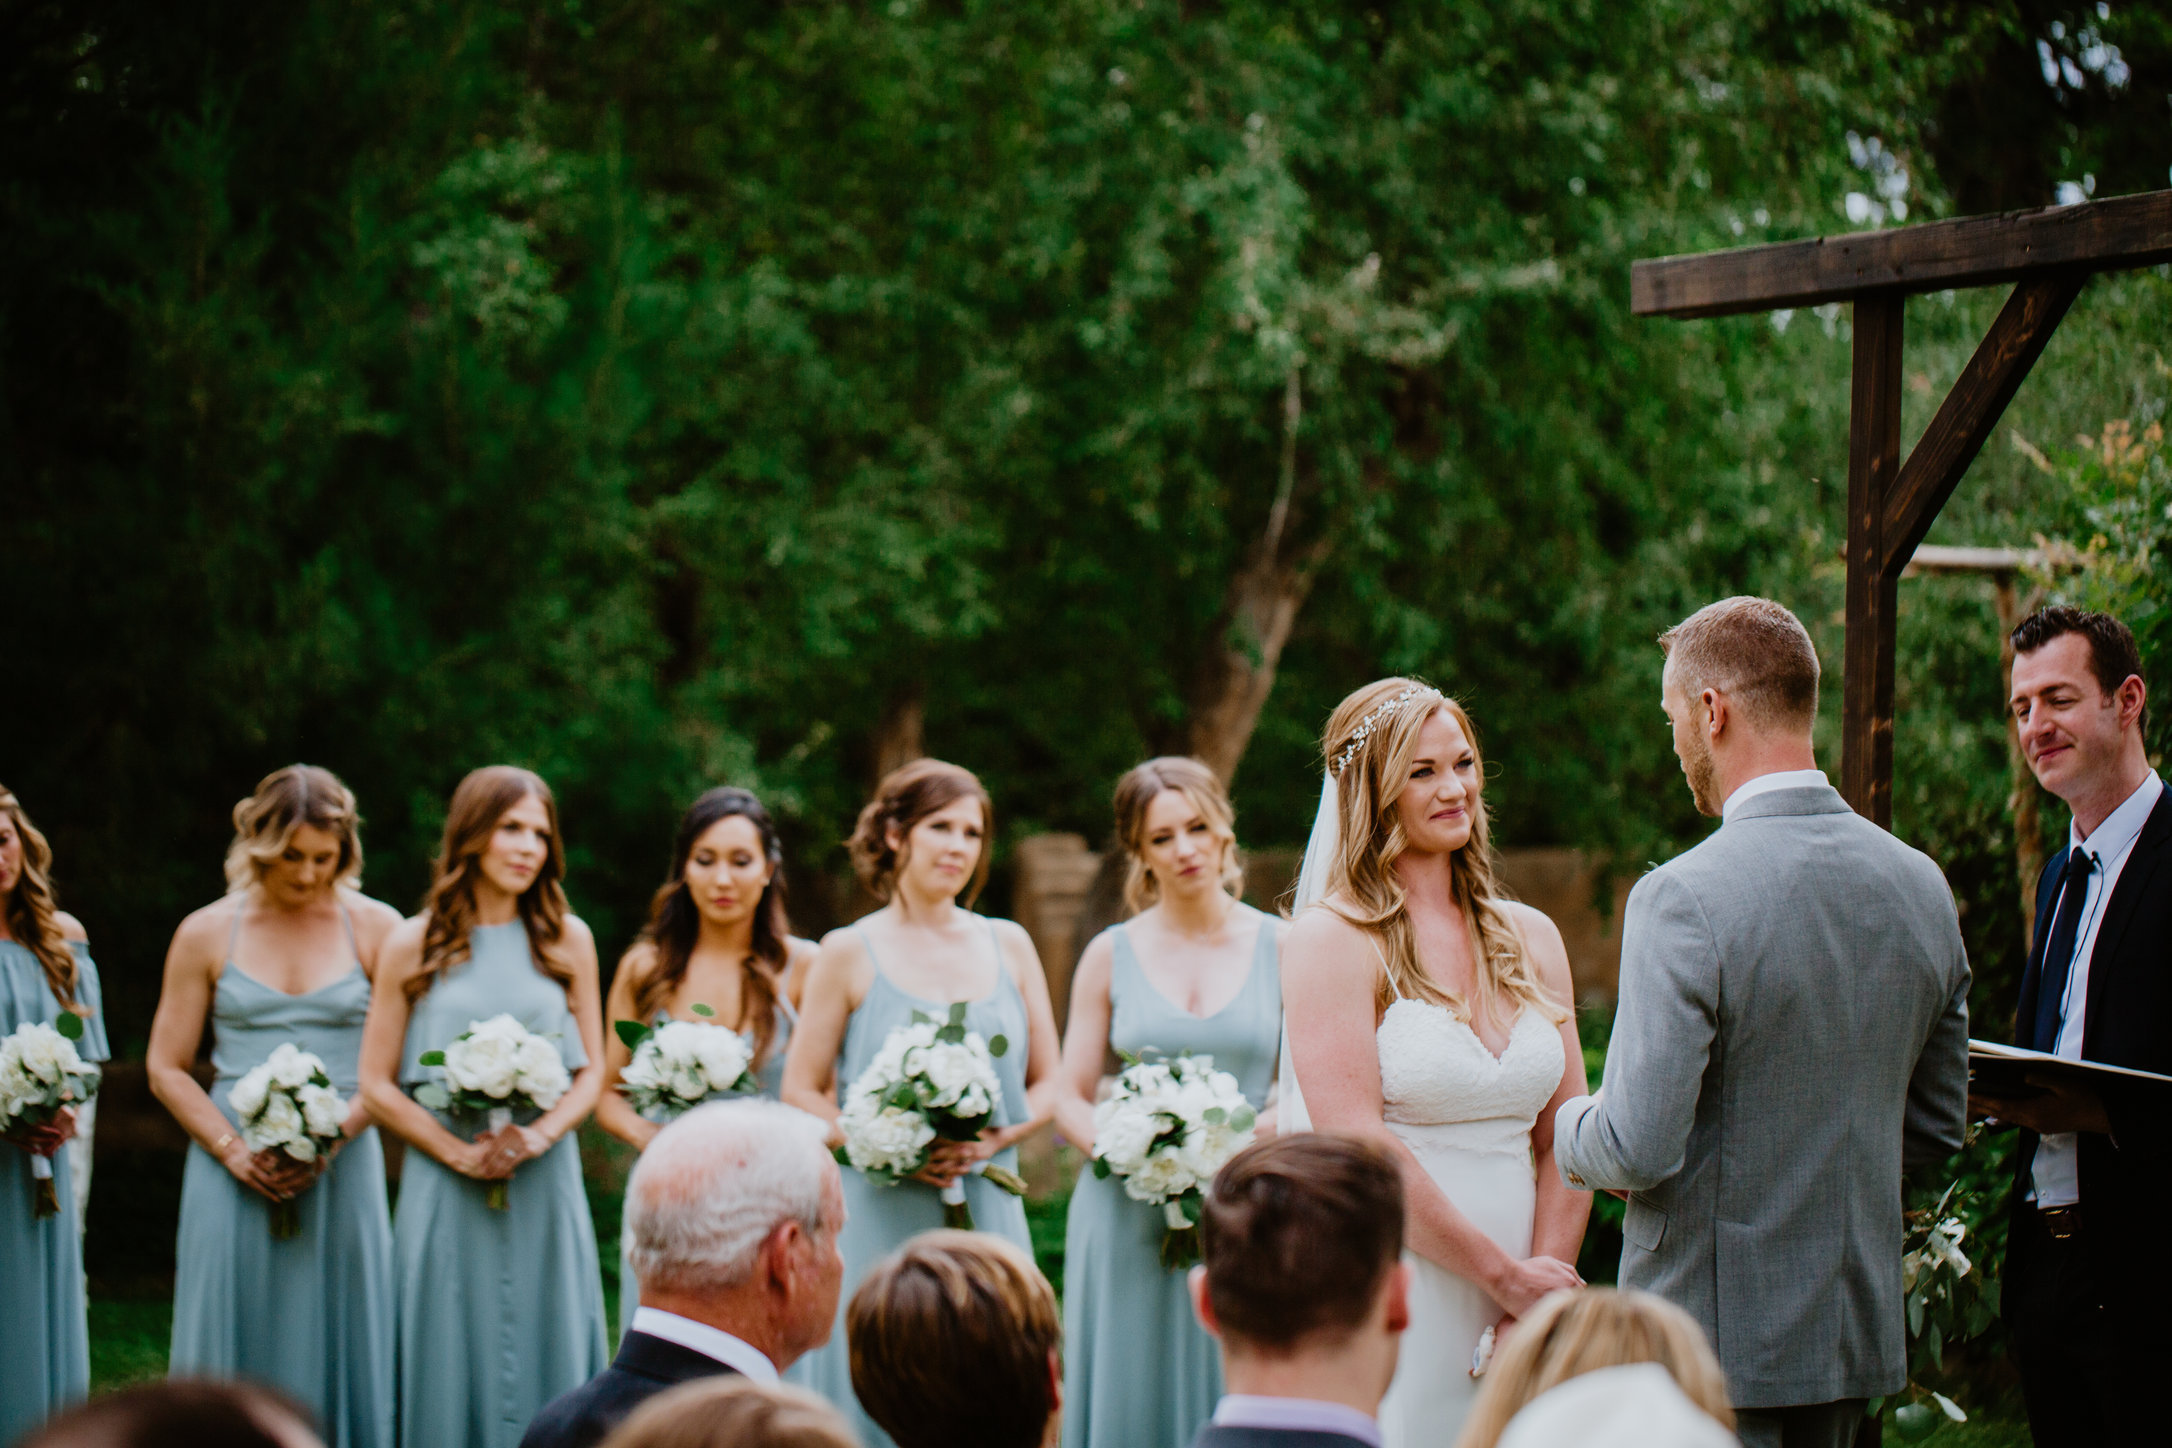 DandA-wedding-286.jpg